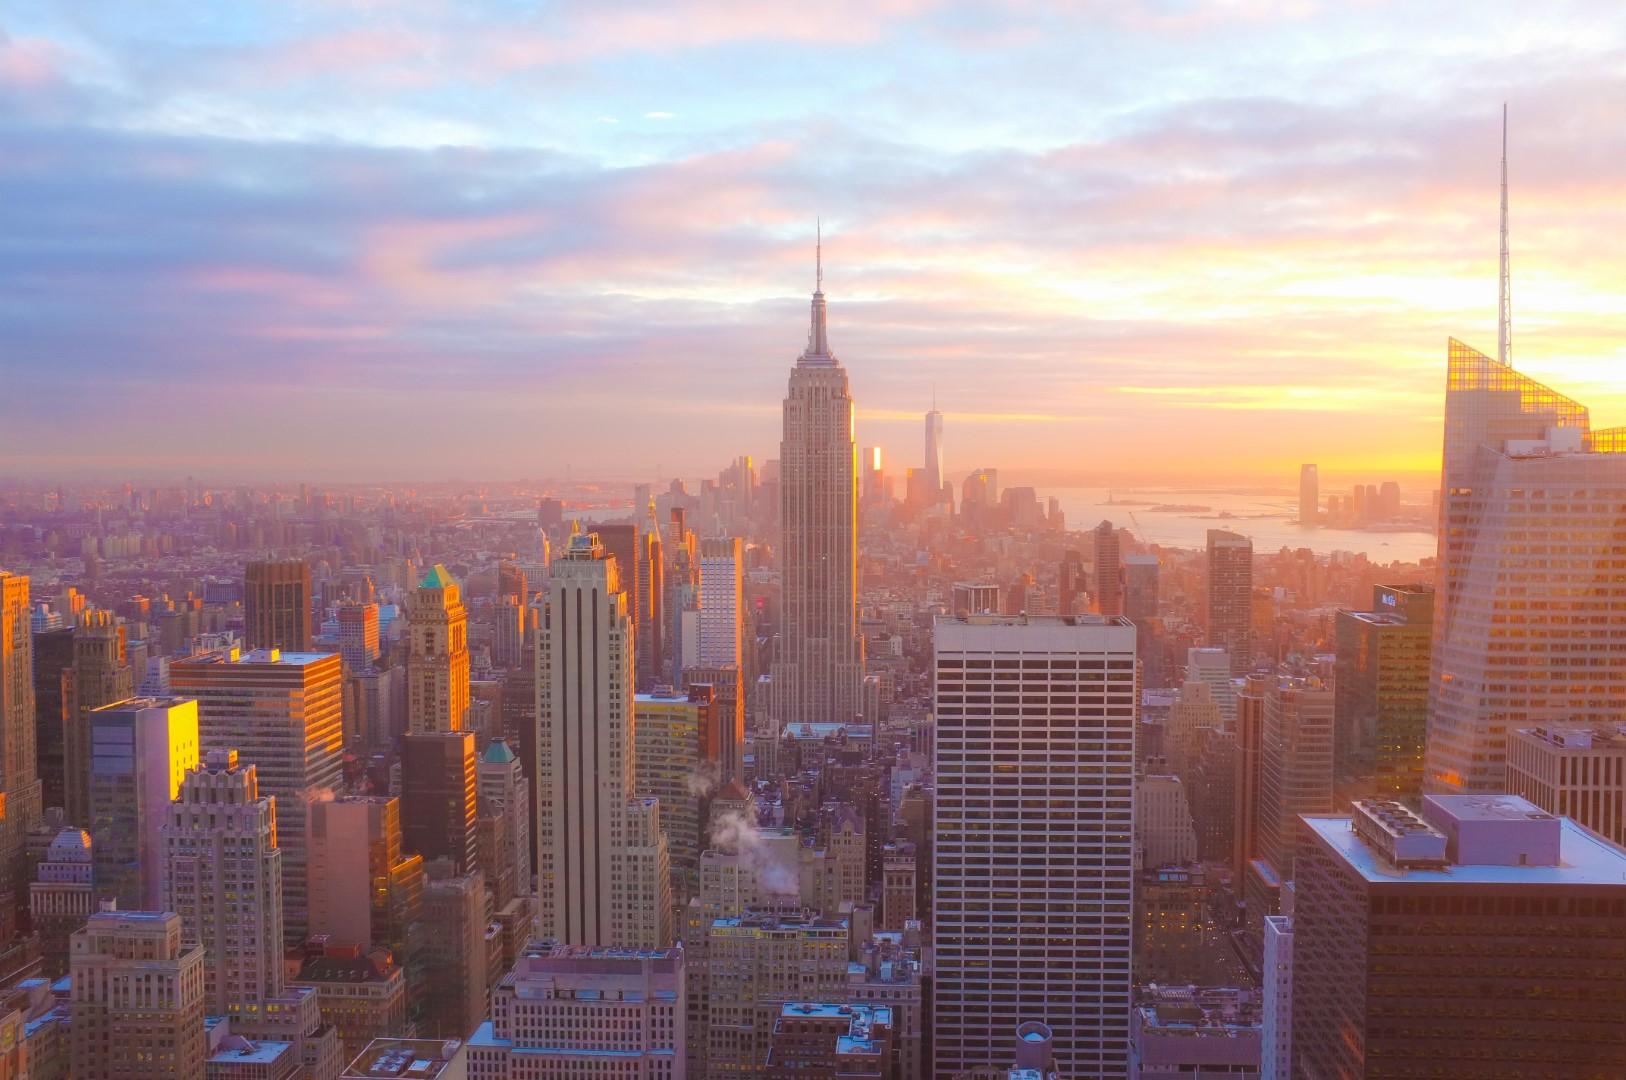 NYC Skyline from Rockefeller Center